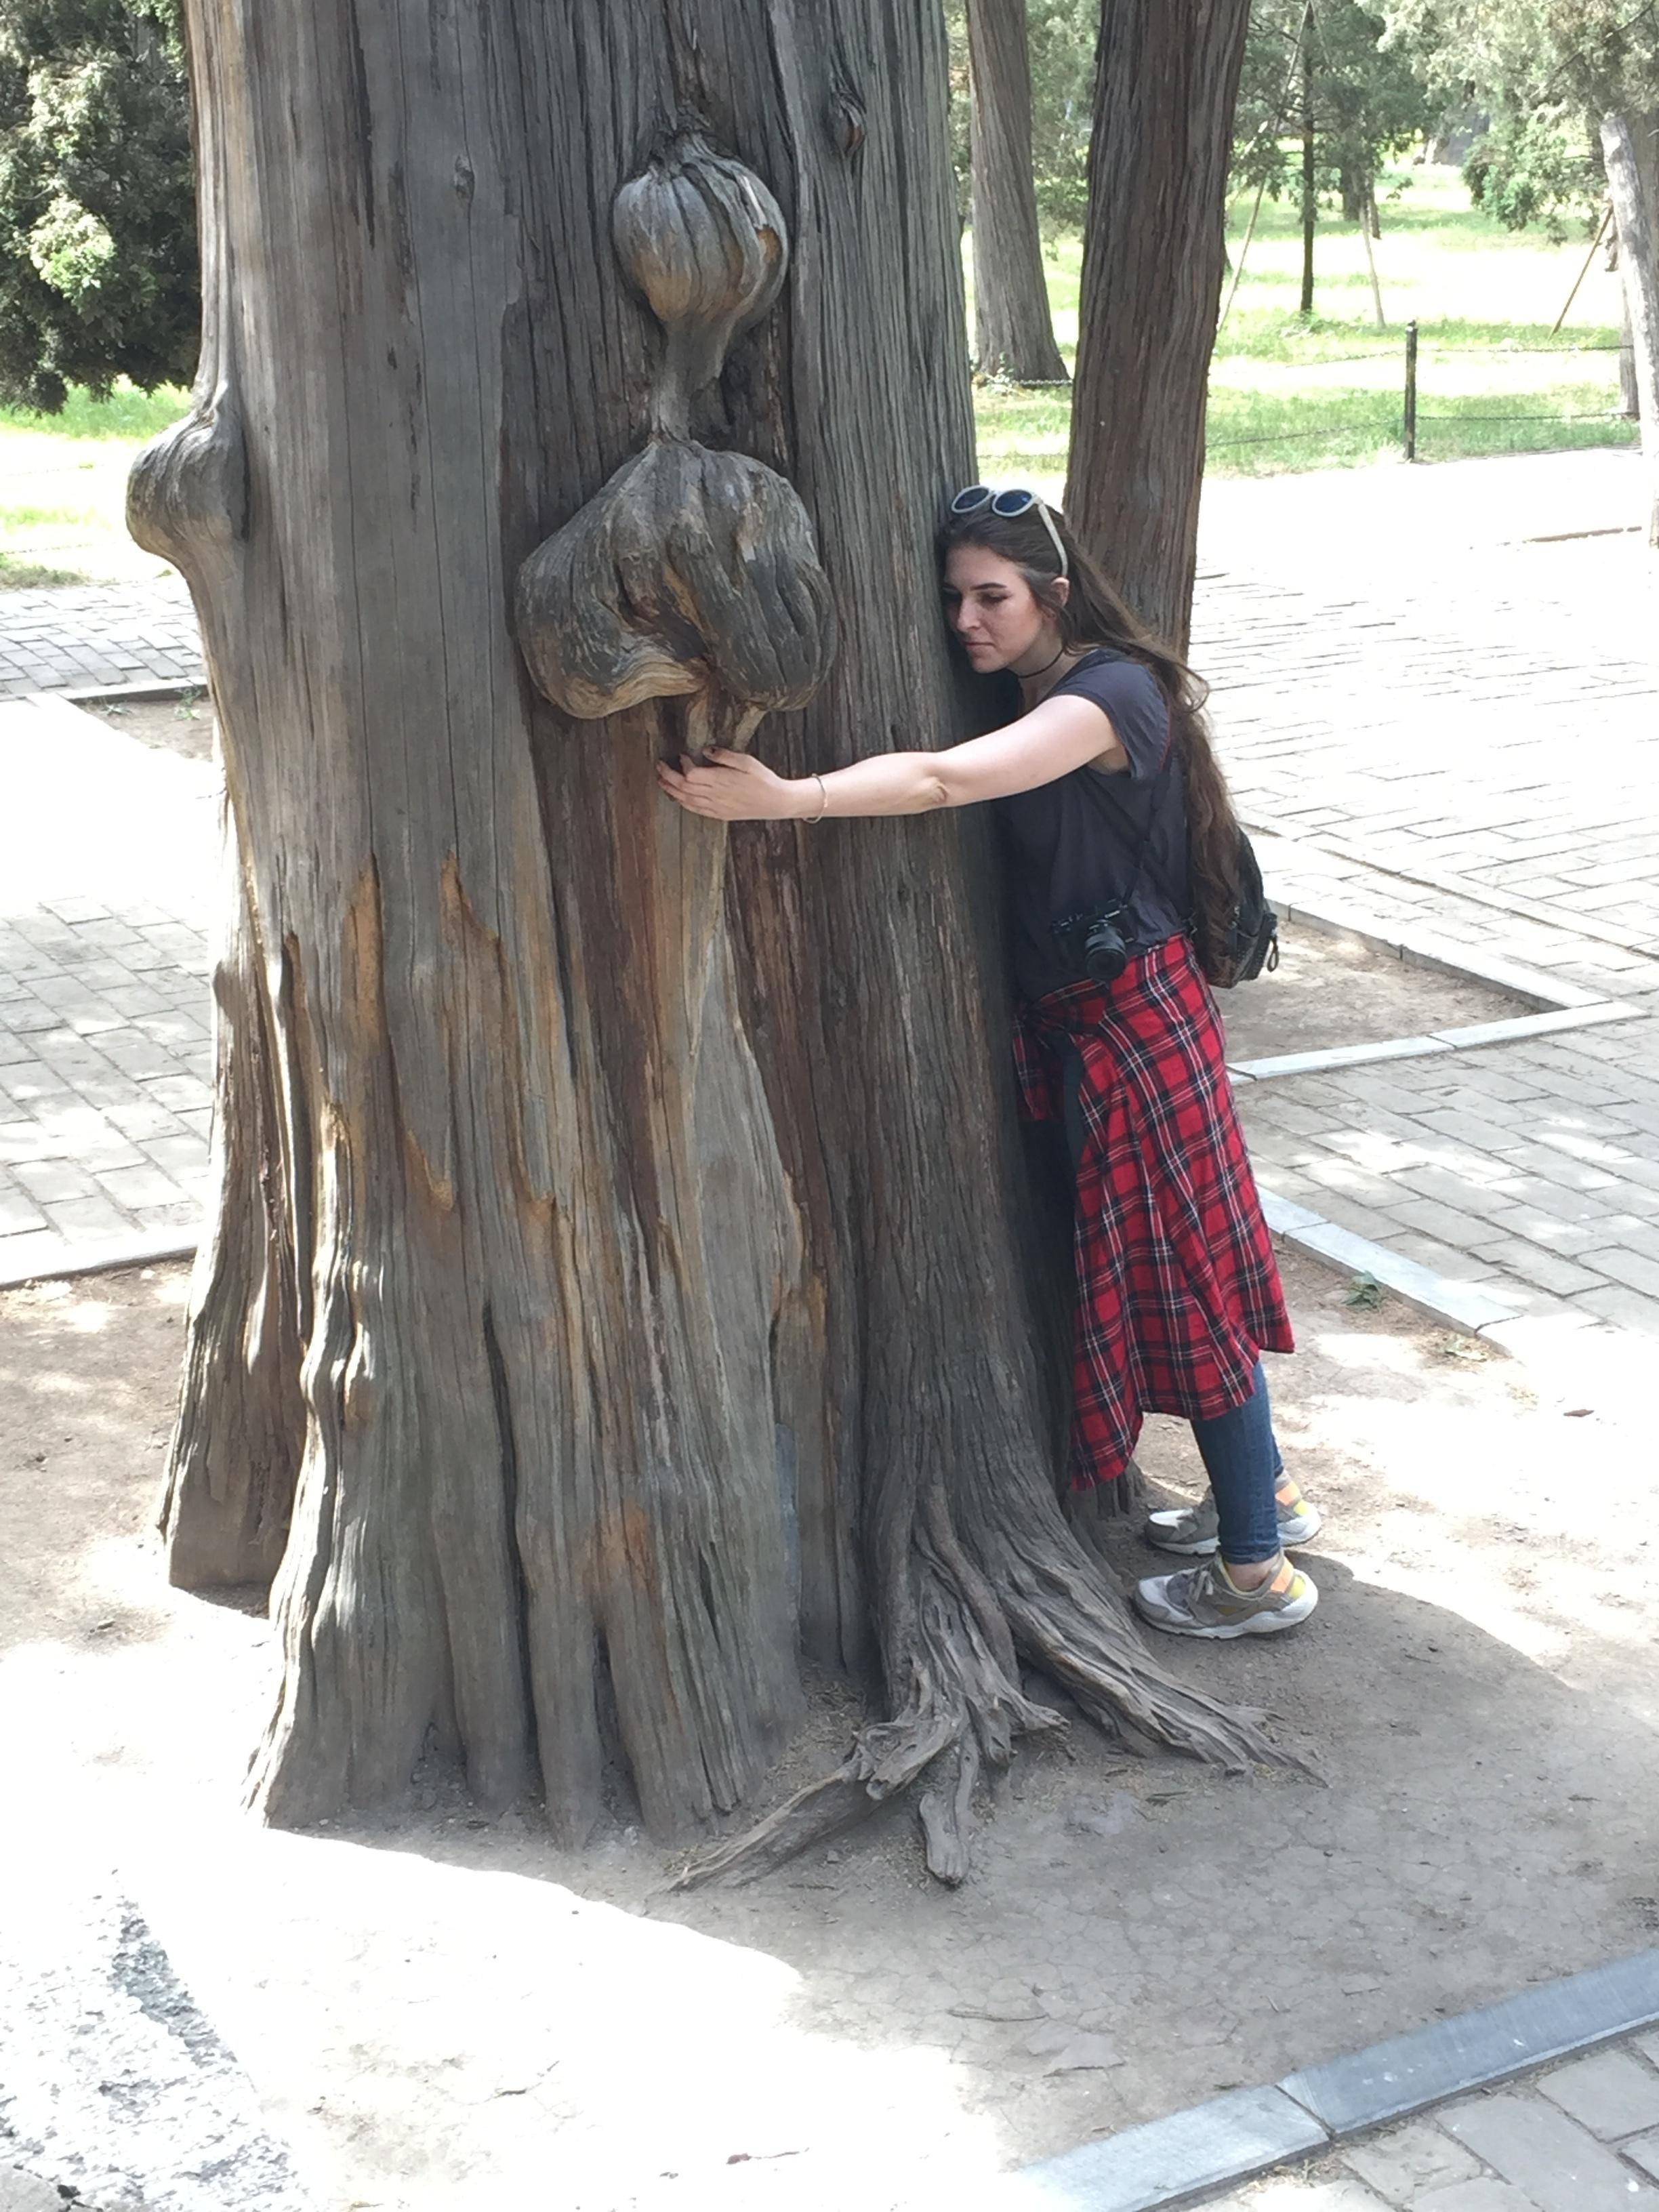 Oldddd tree.